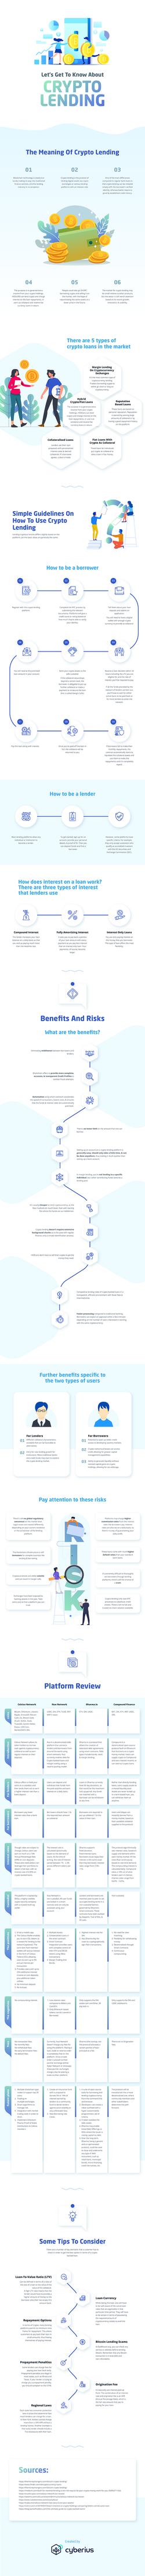 Infographic - Crypto Lending